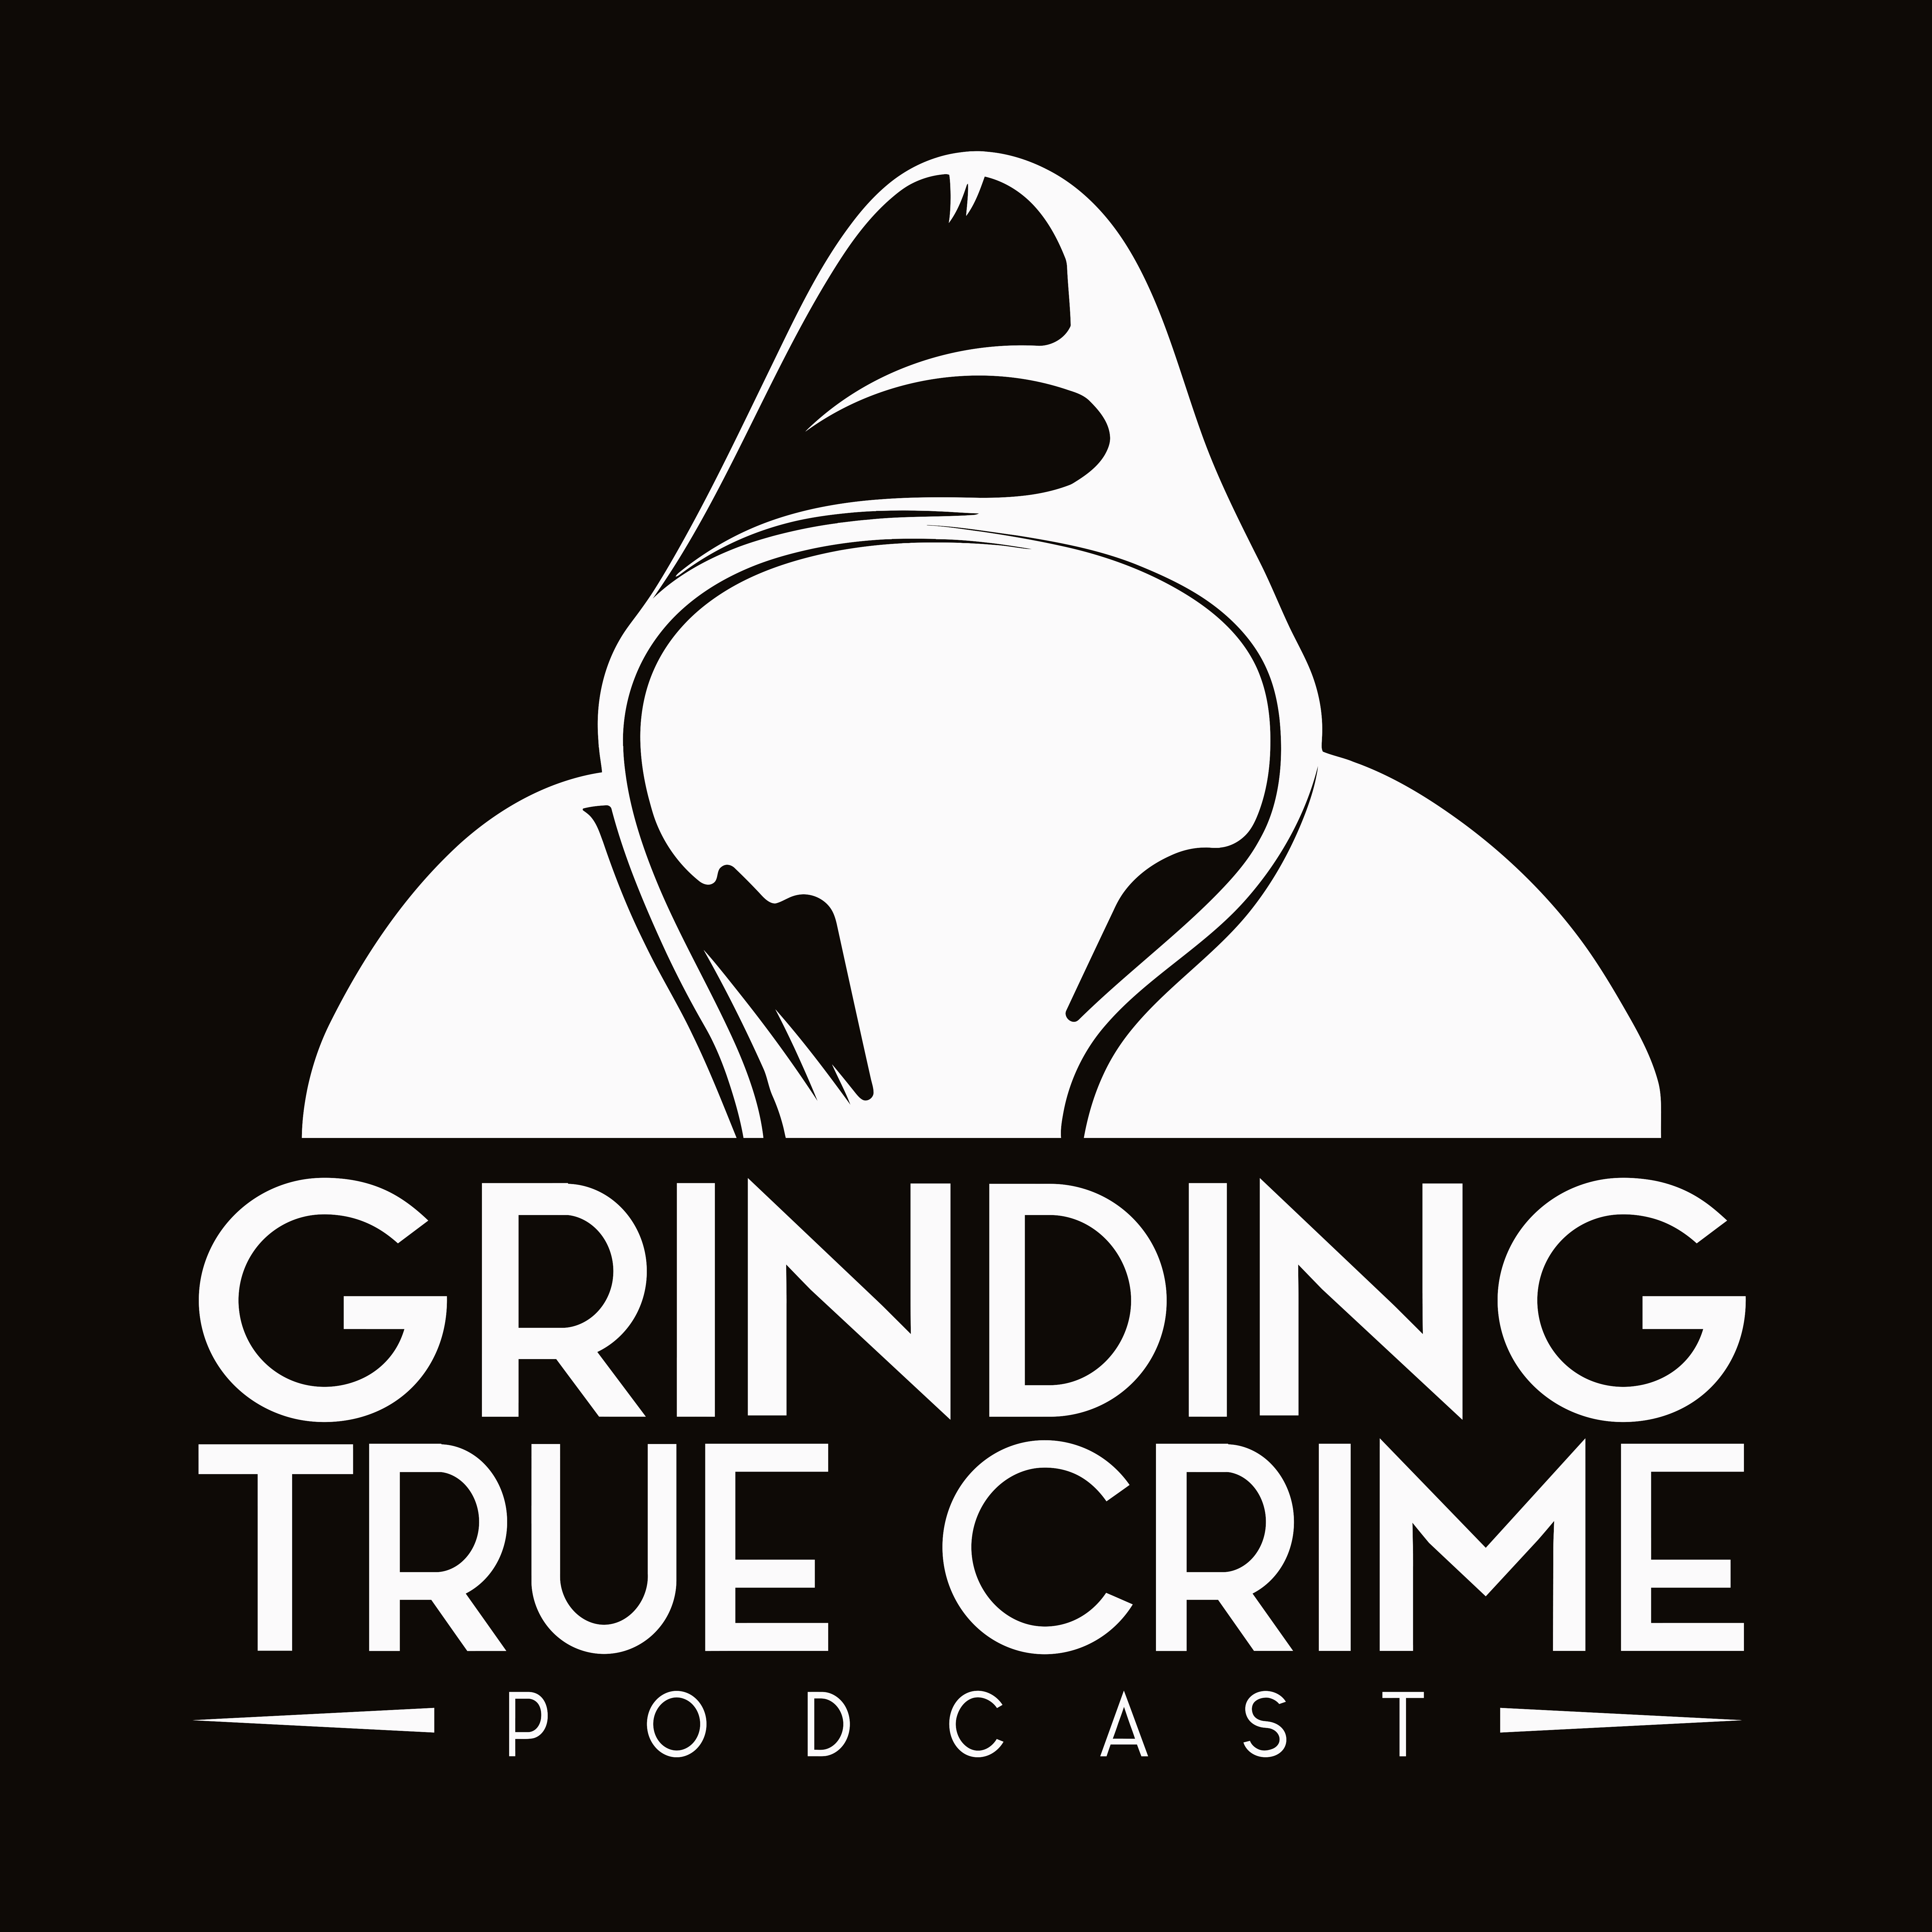 Grinding true crime Podcast